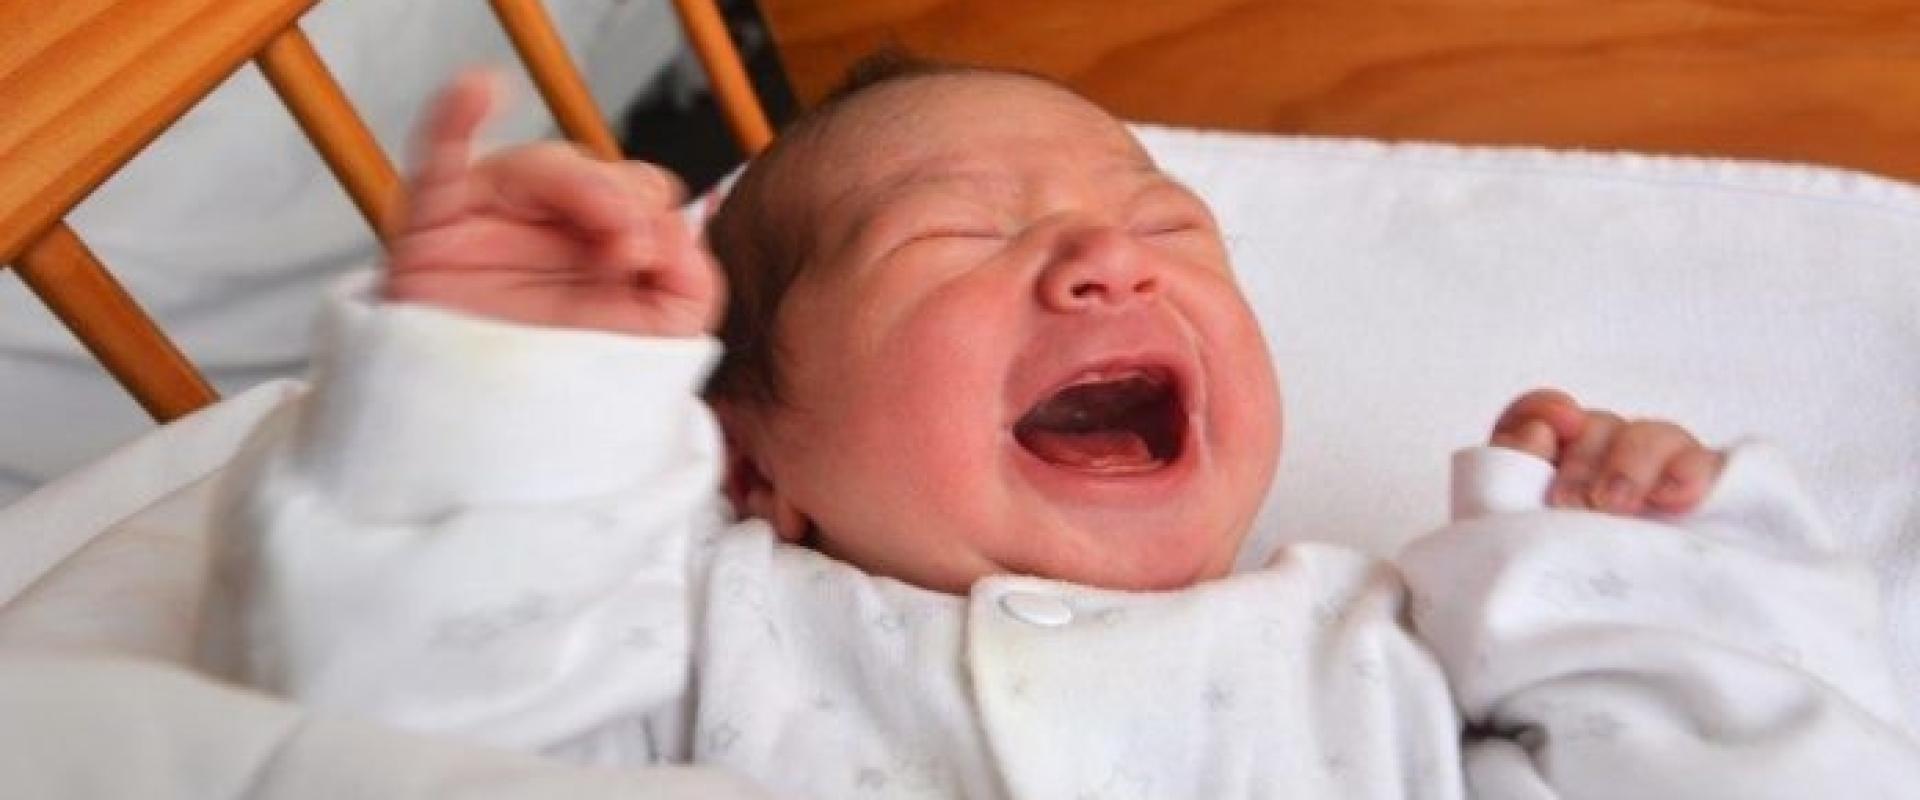 Traumabehandeling voor geboortetrauma